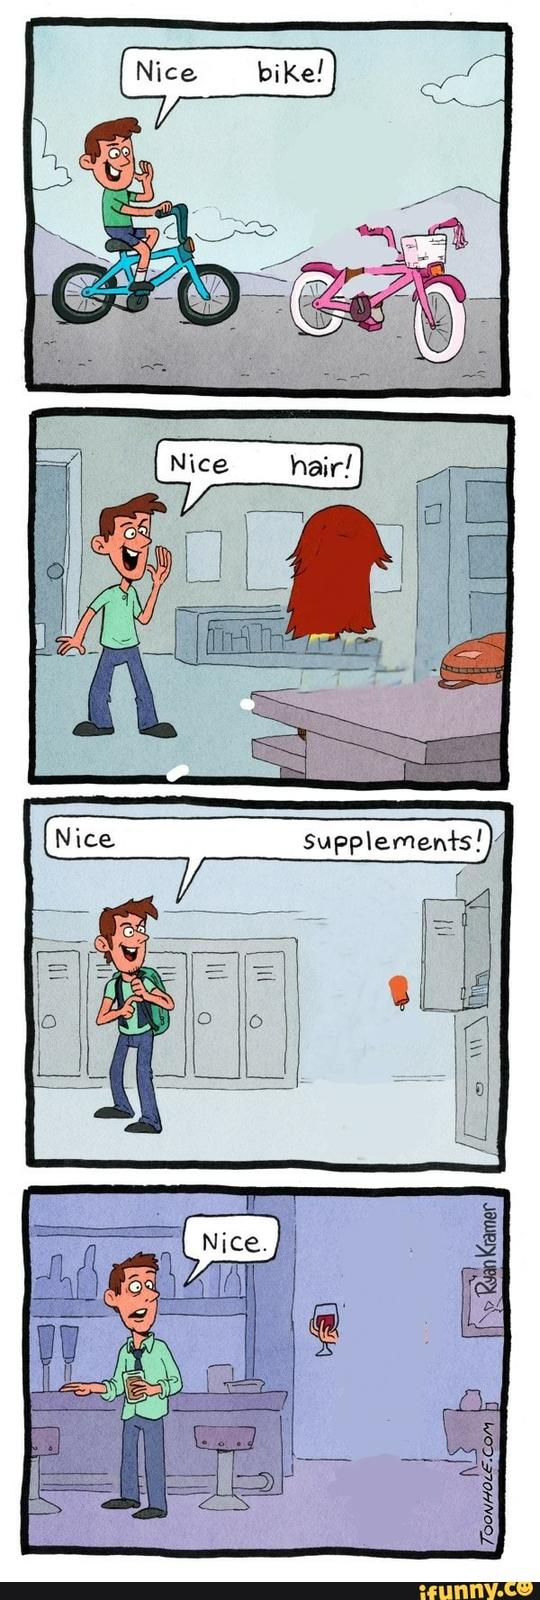 Trans Nice